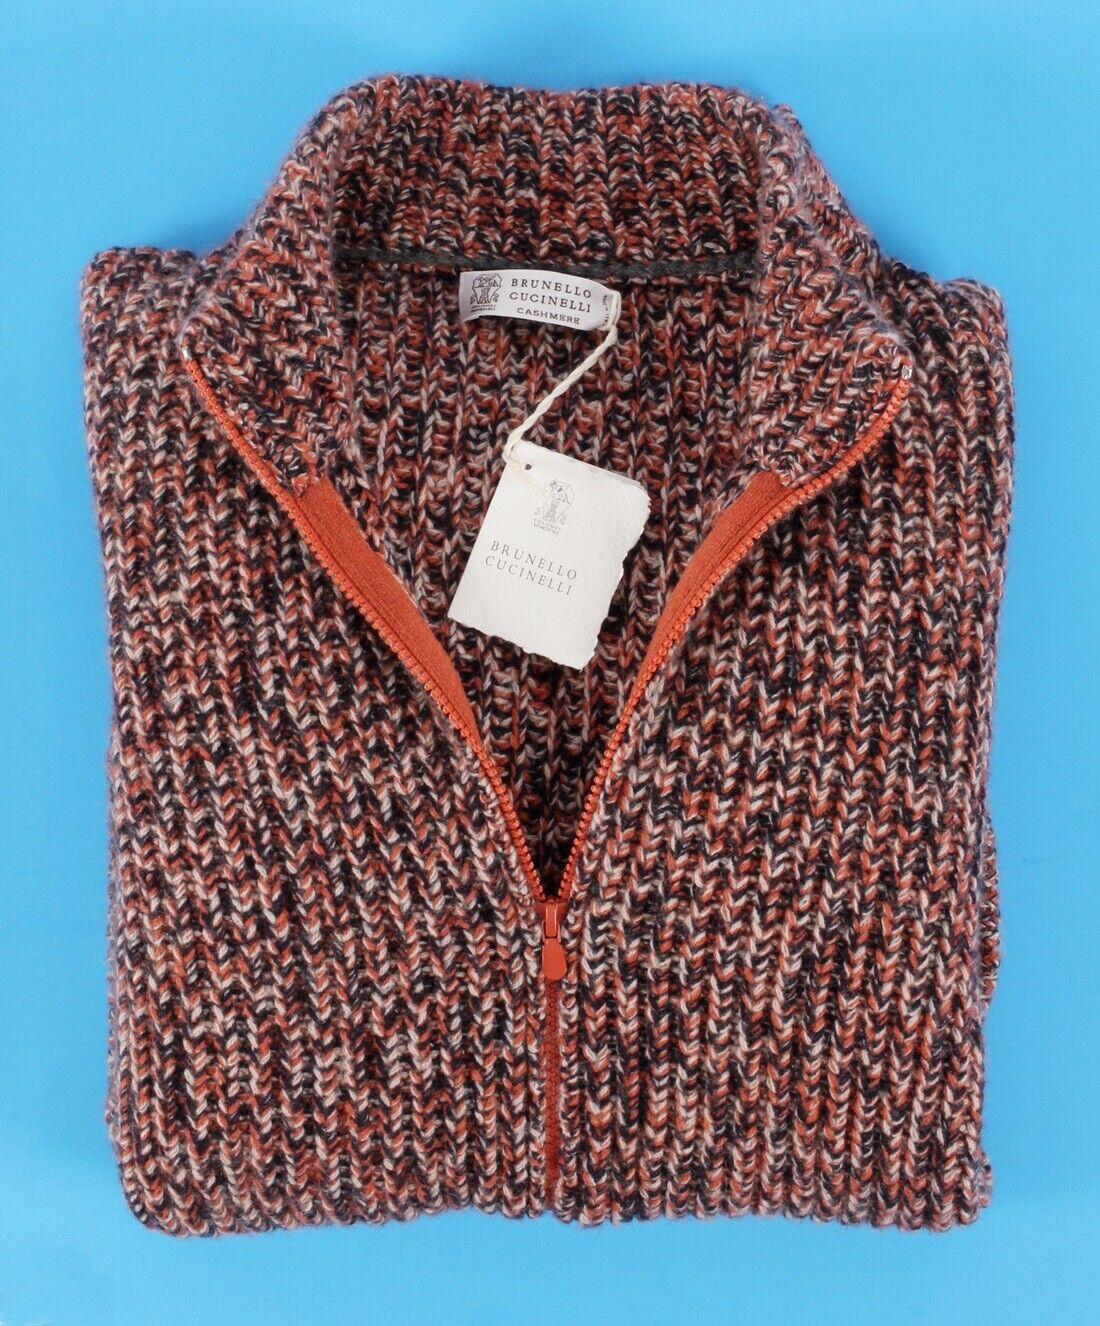 3045 NWT BRUNELLO CUCINELLI 100% CASHMERE Full Zip Sweater - Orange Melange L